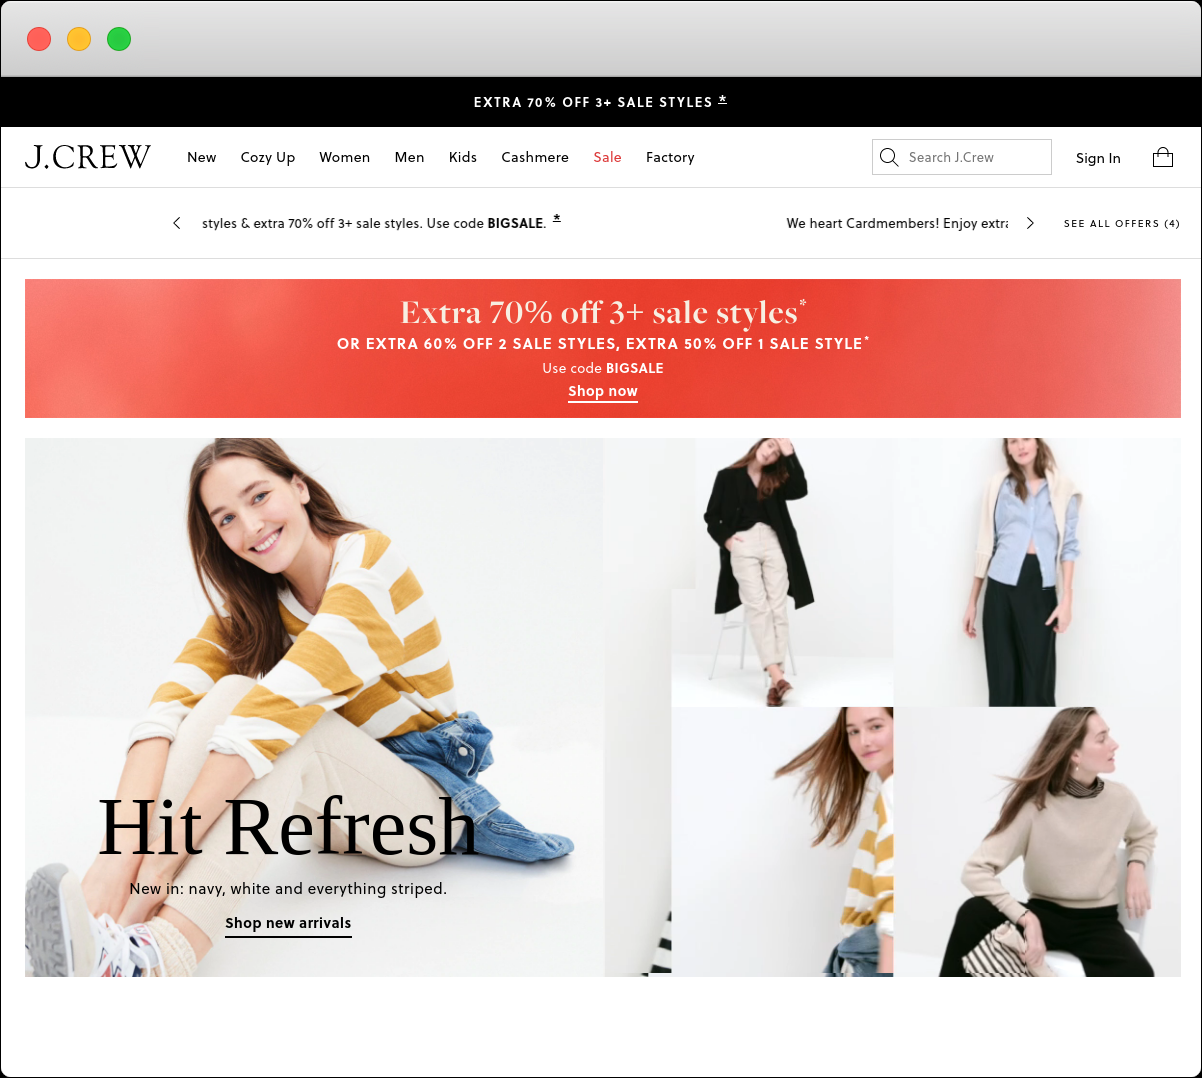 jcrew-digital-storefront